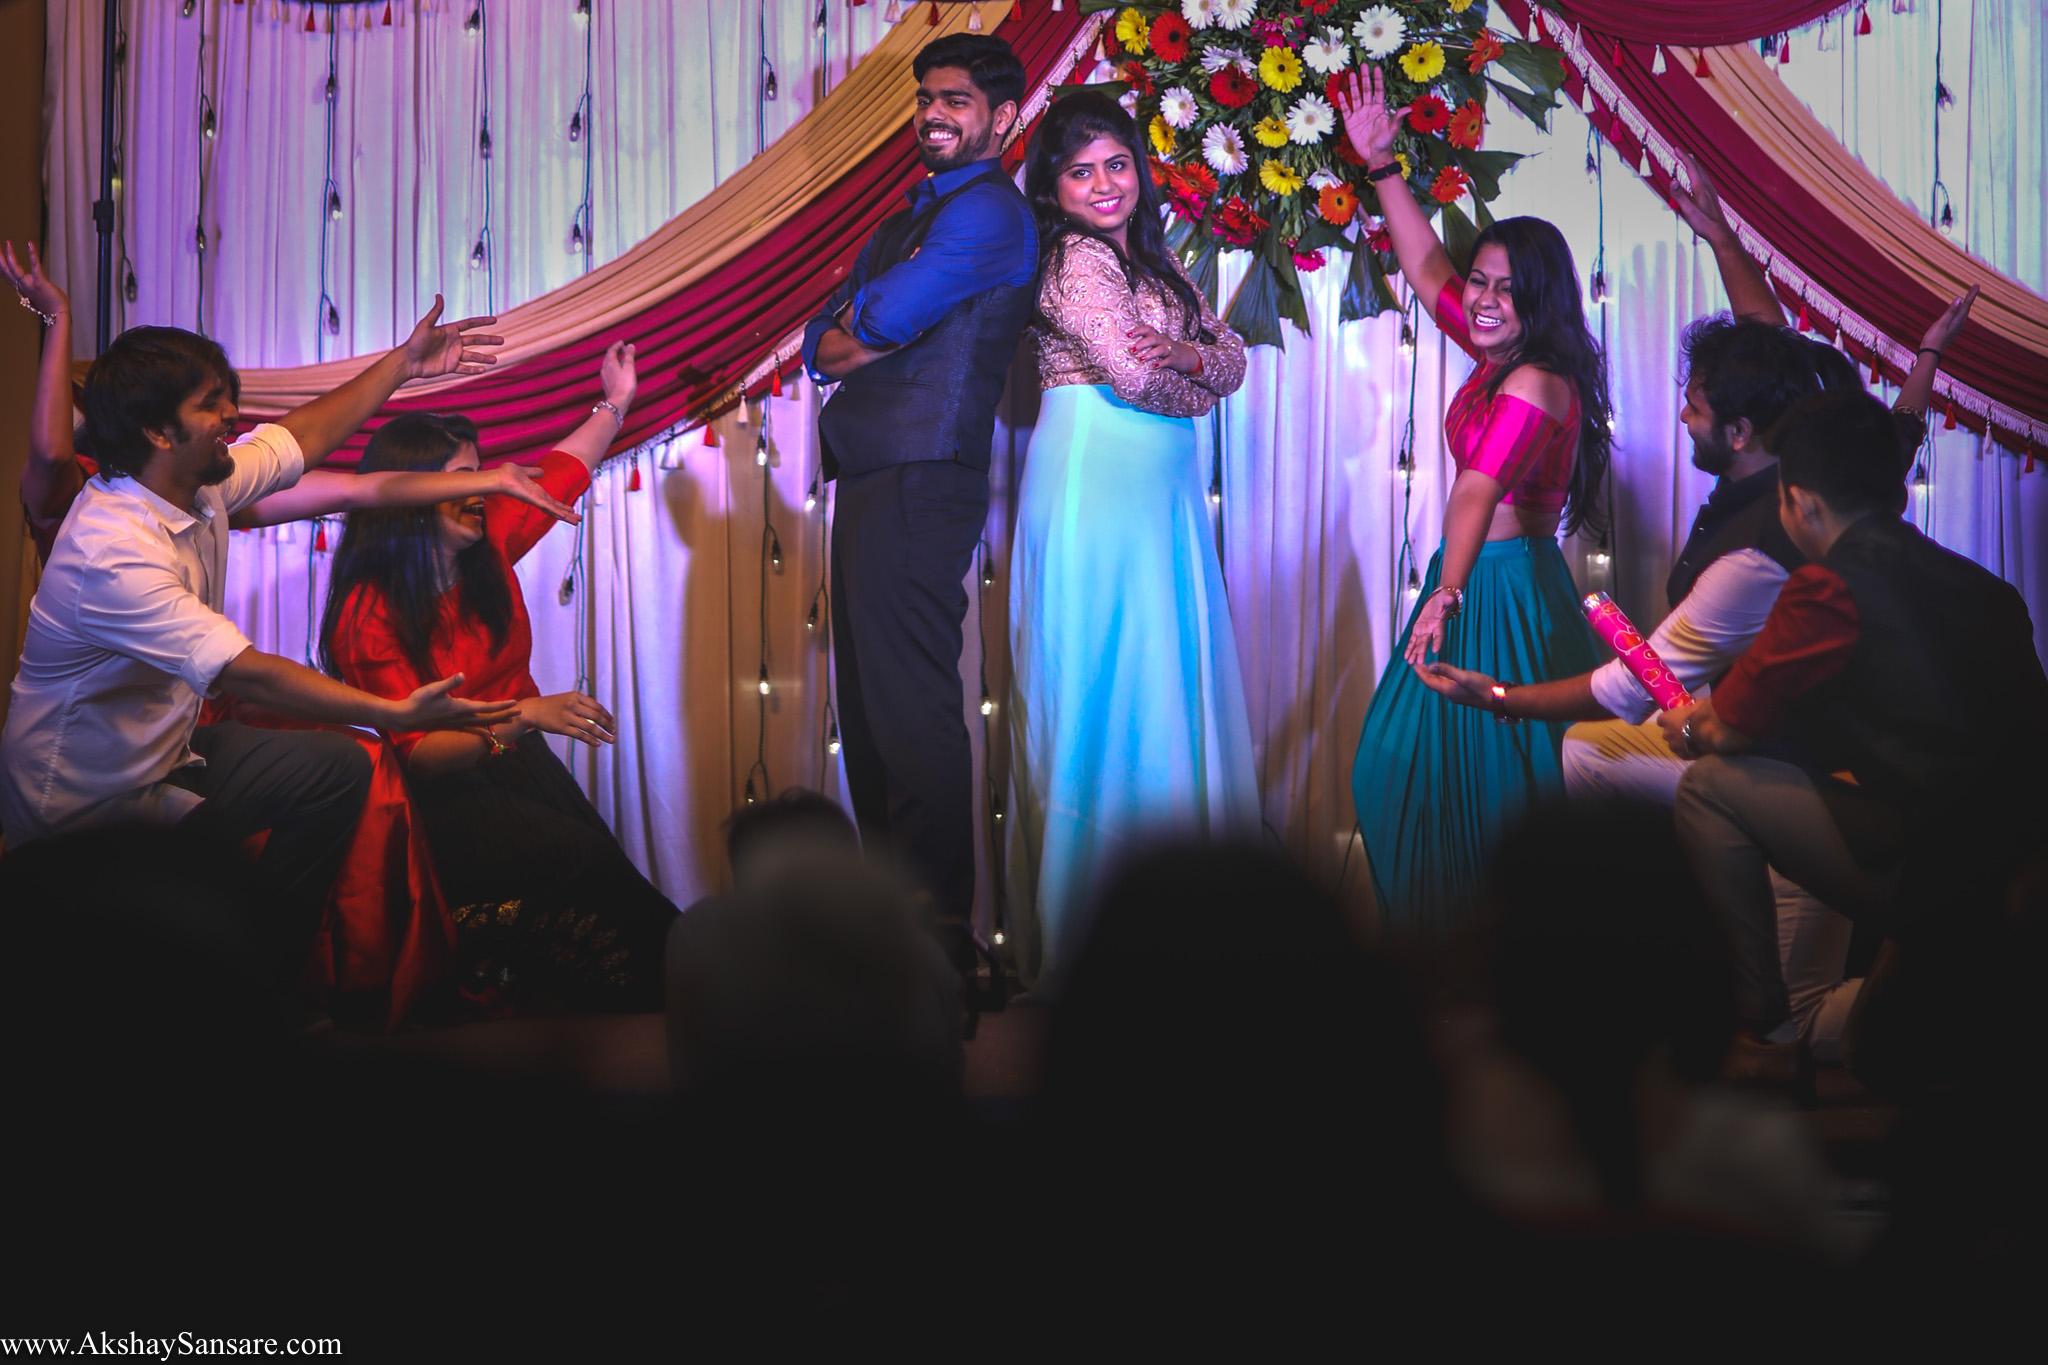 Akshay Sansare Best Candid Photographers in Mumbai (7).jpg